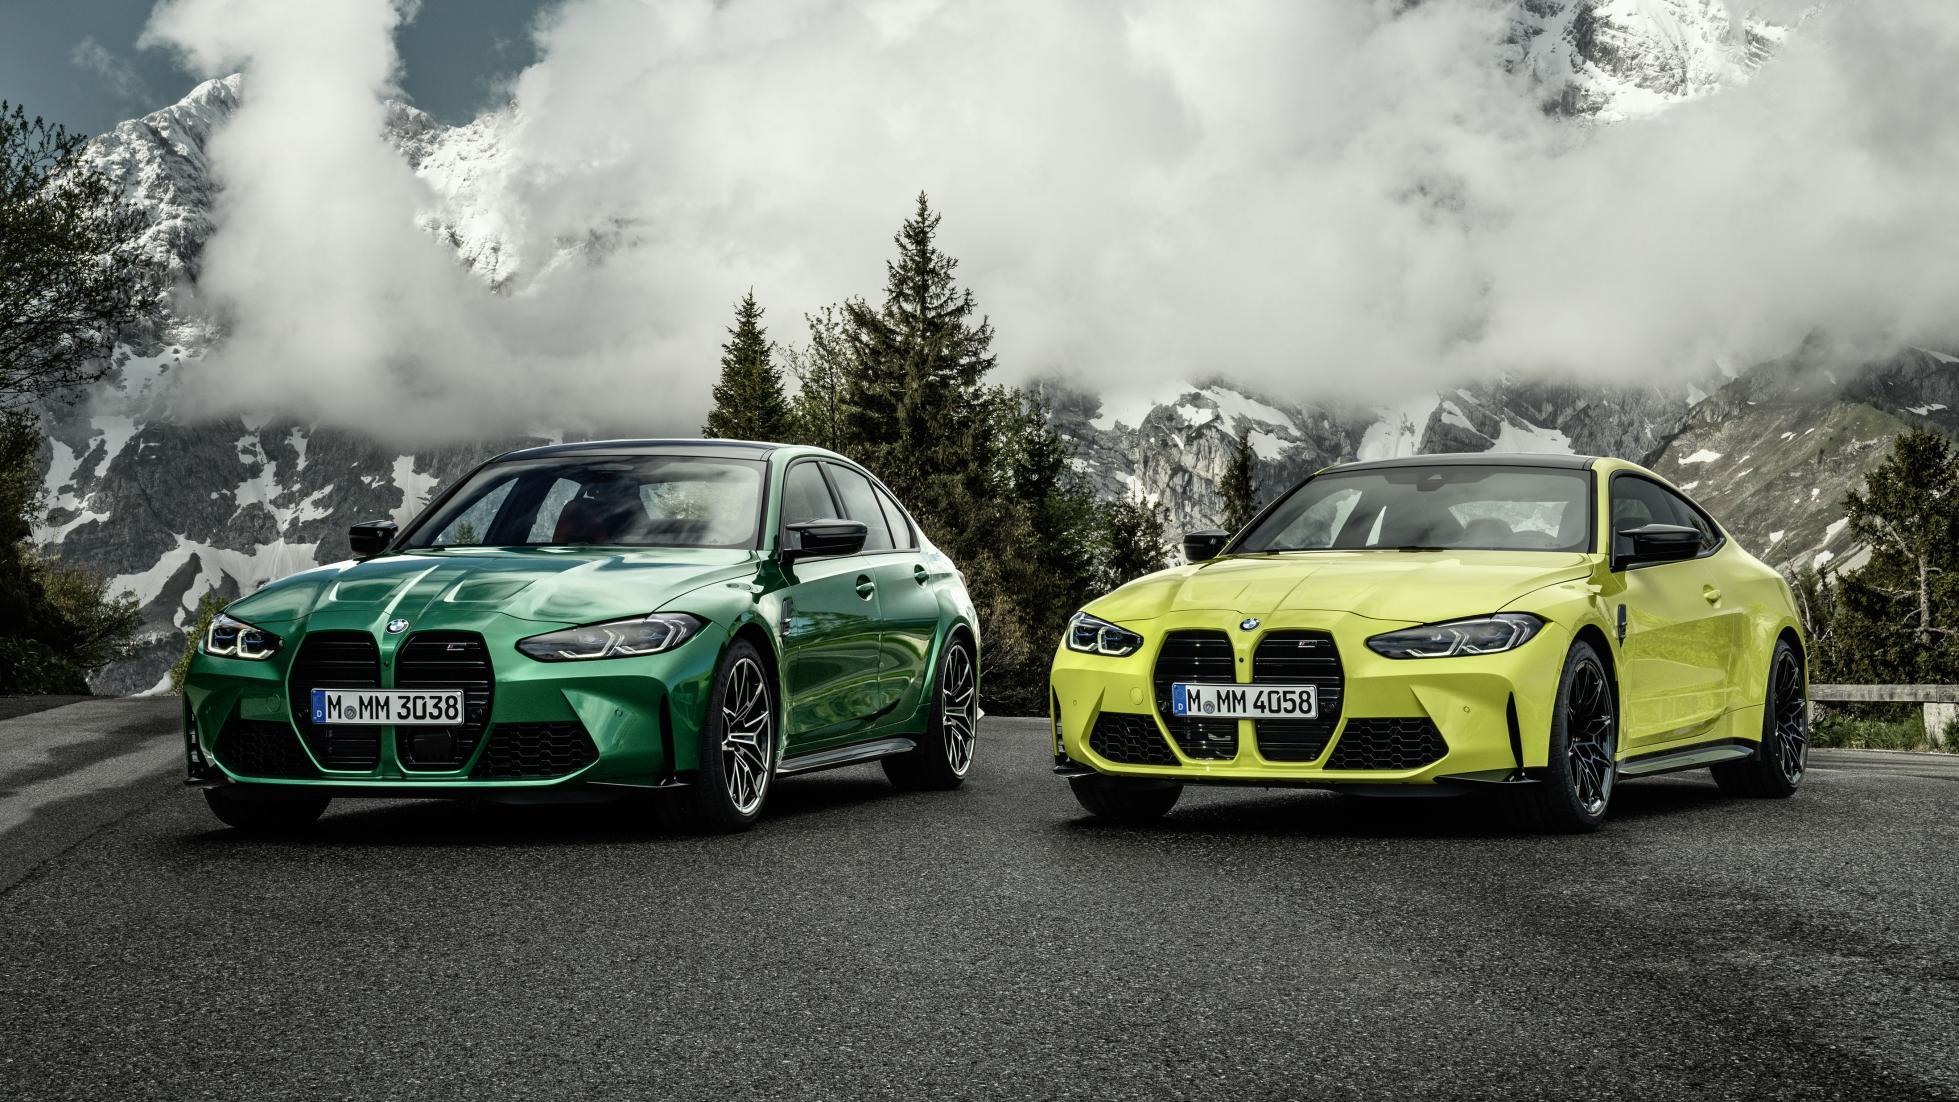 2020 BMW M3, M4: Specs, Price, Features, Video